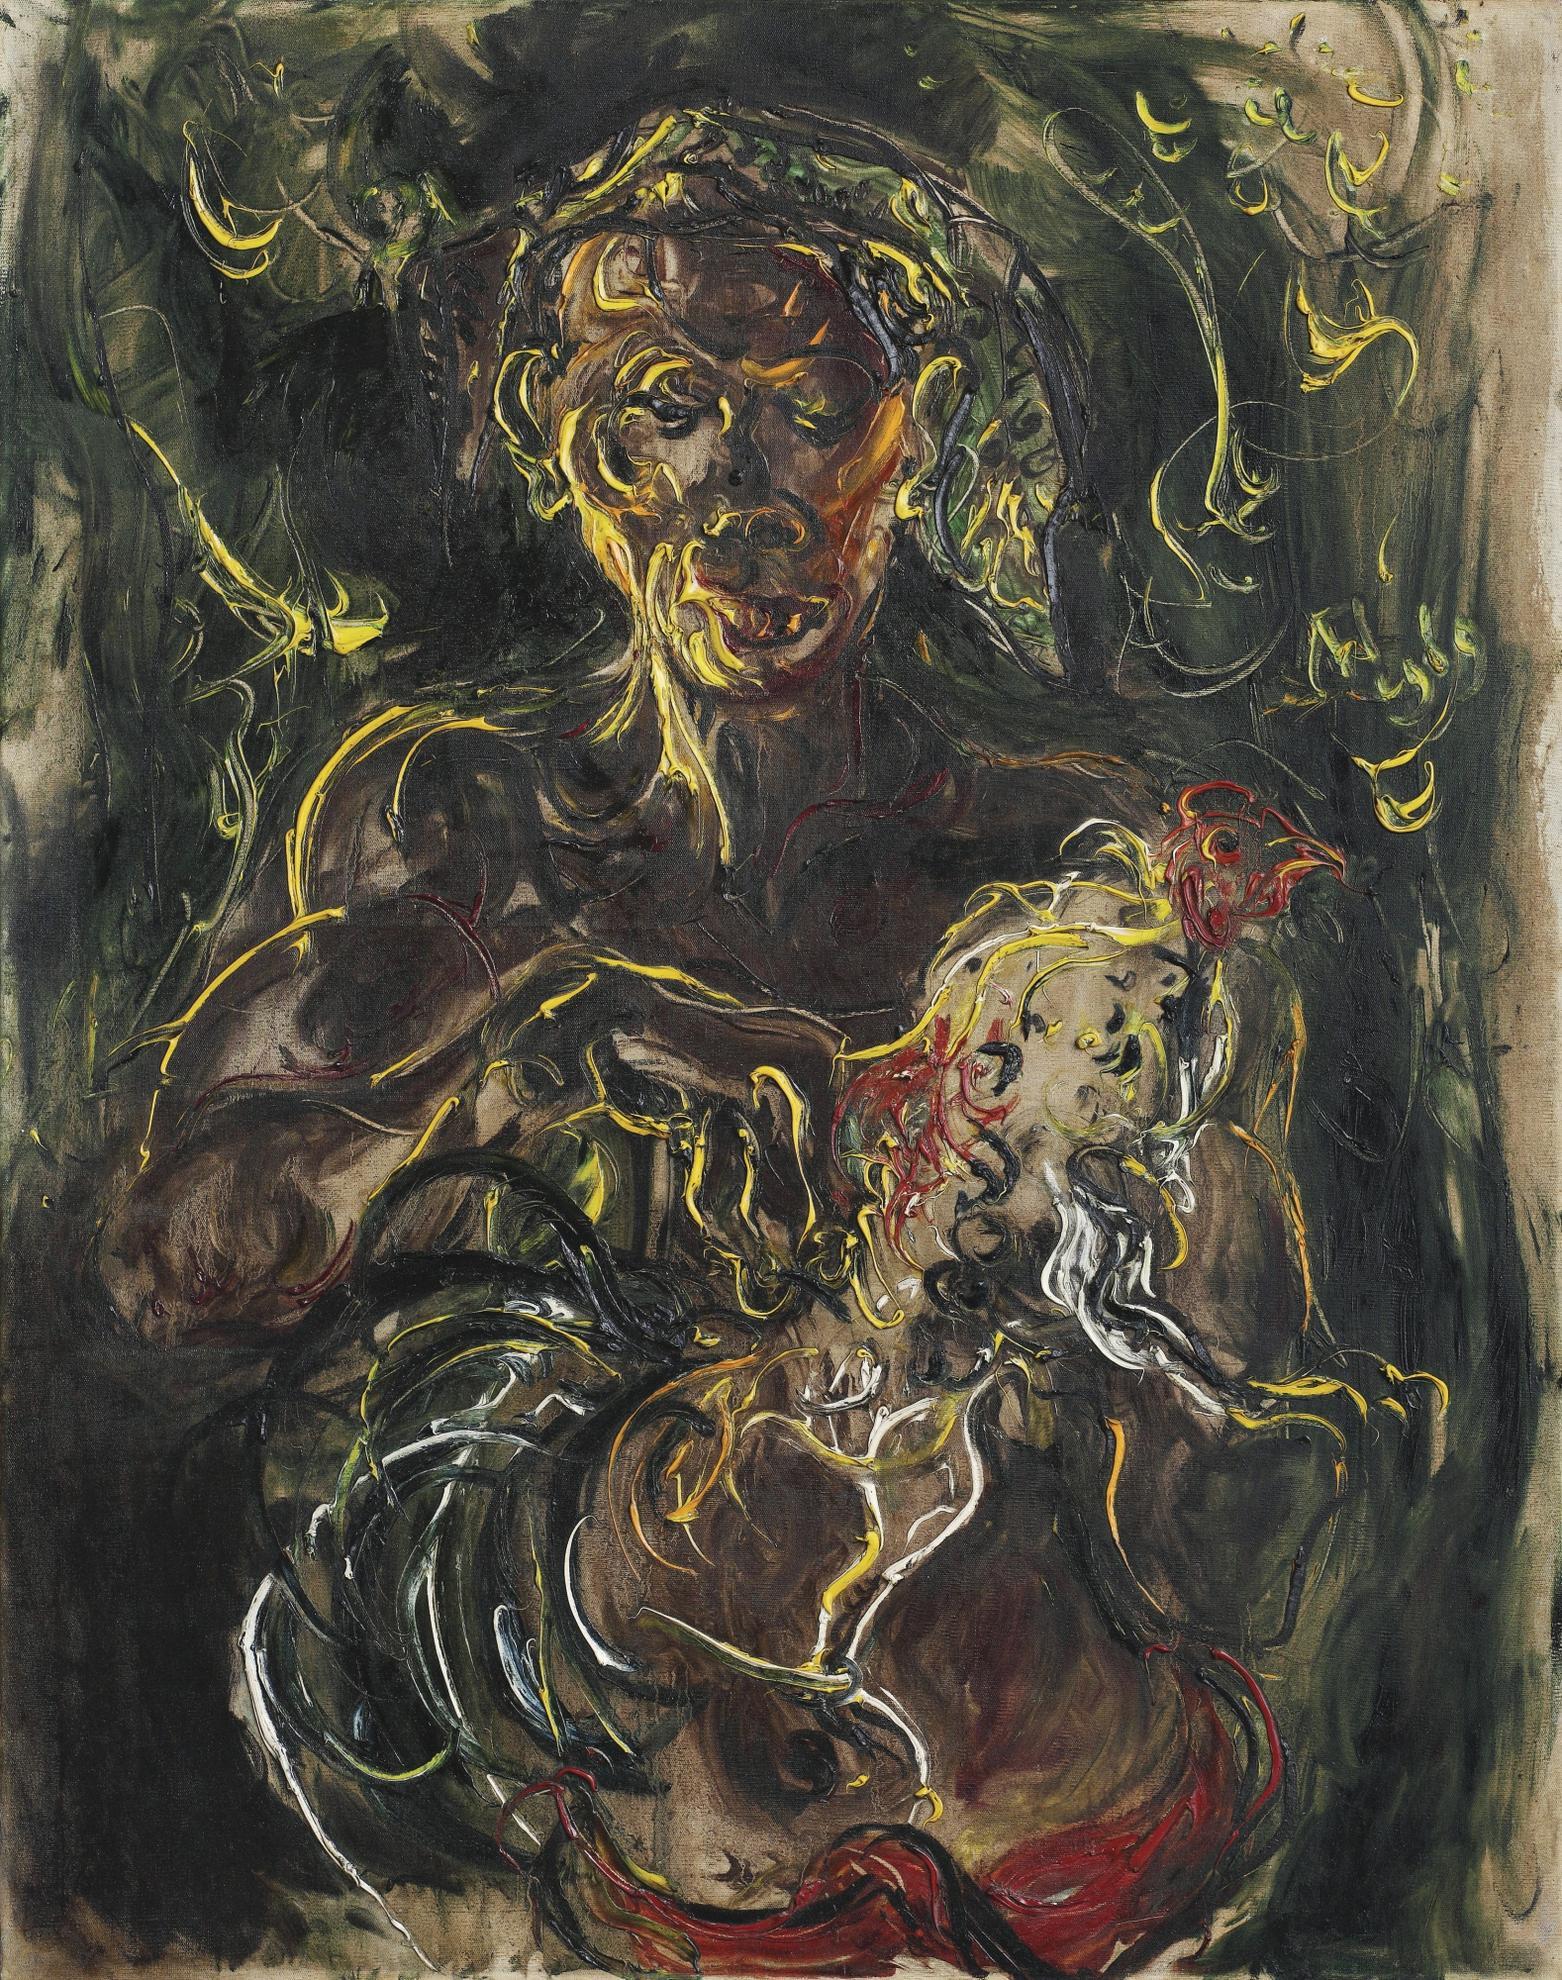 Affandi-Man With Cockerel-1969